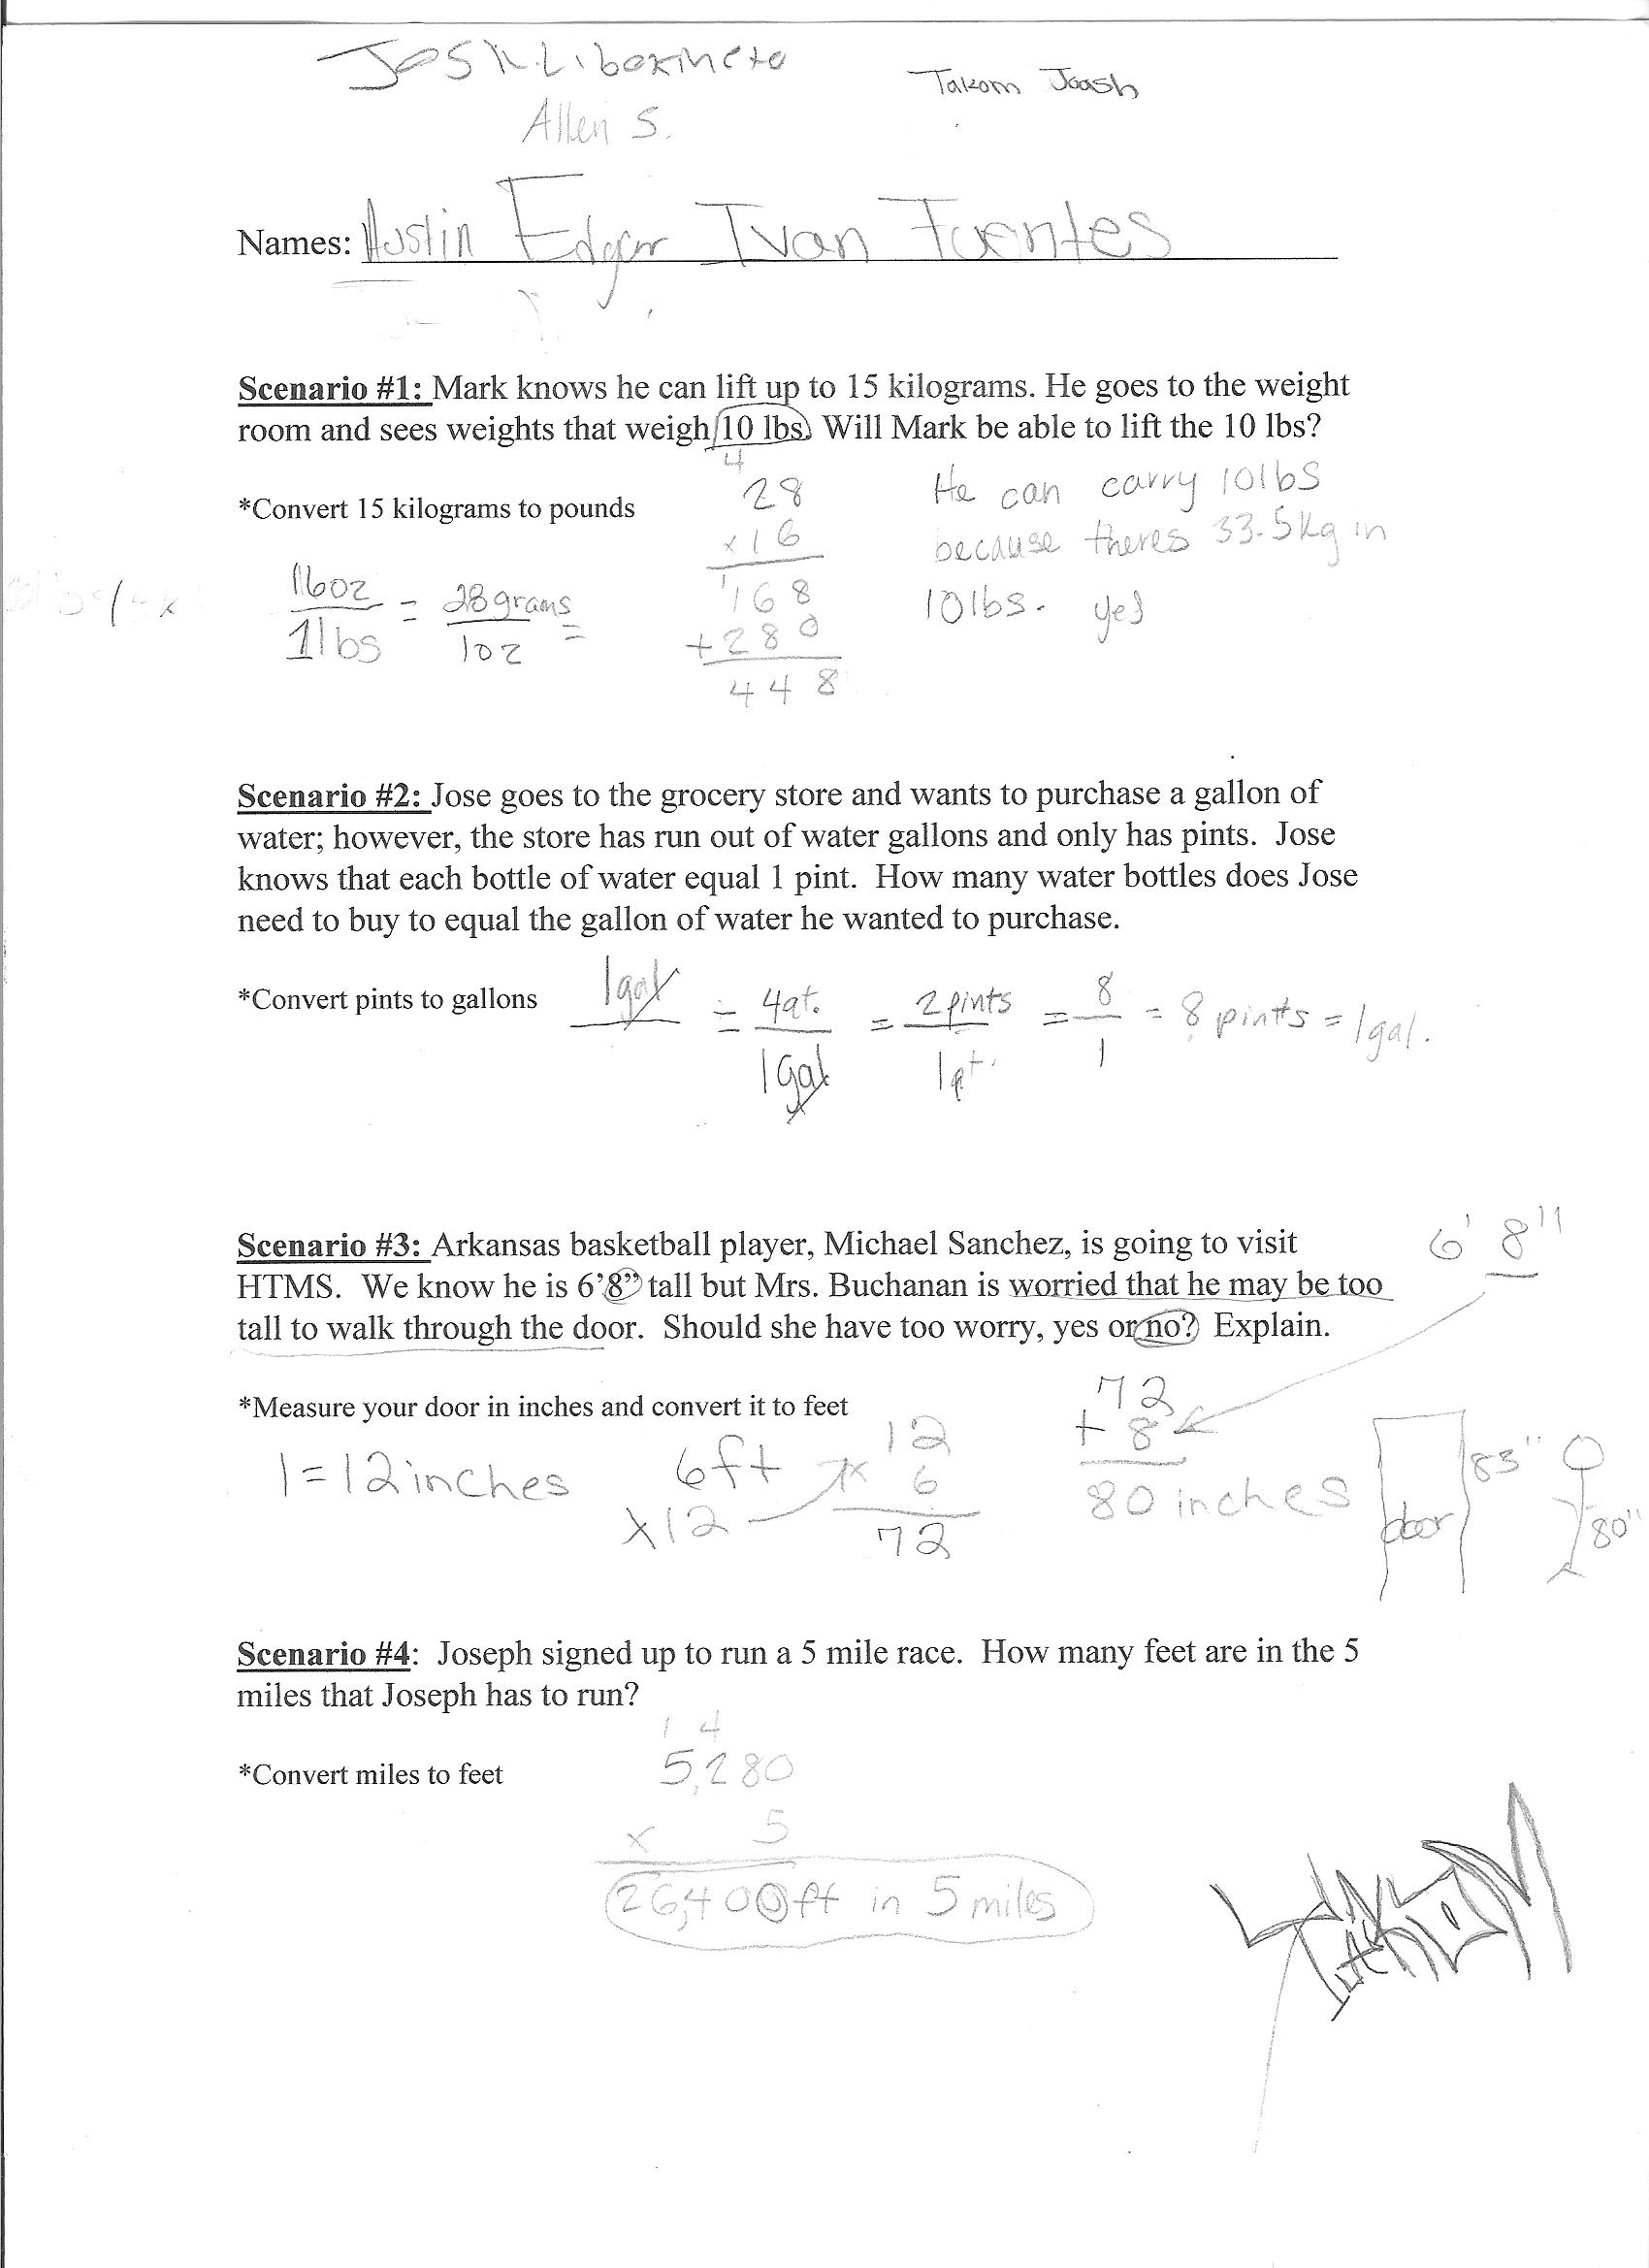 worksheet Converting Feet To Inches Worksheet inches to feet conversion worksheet math fractions a times table chart worksheethtml worksheet